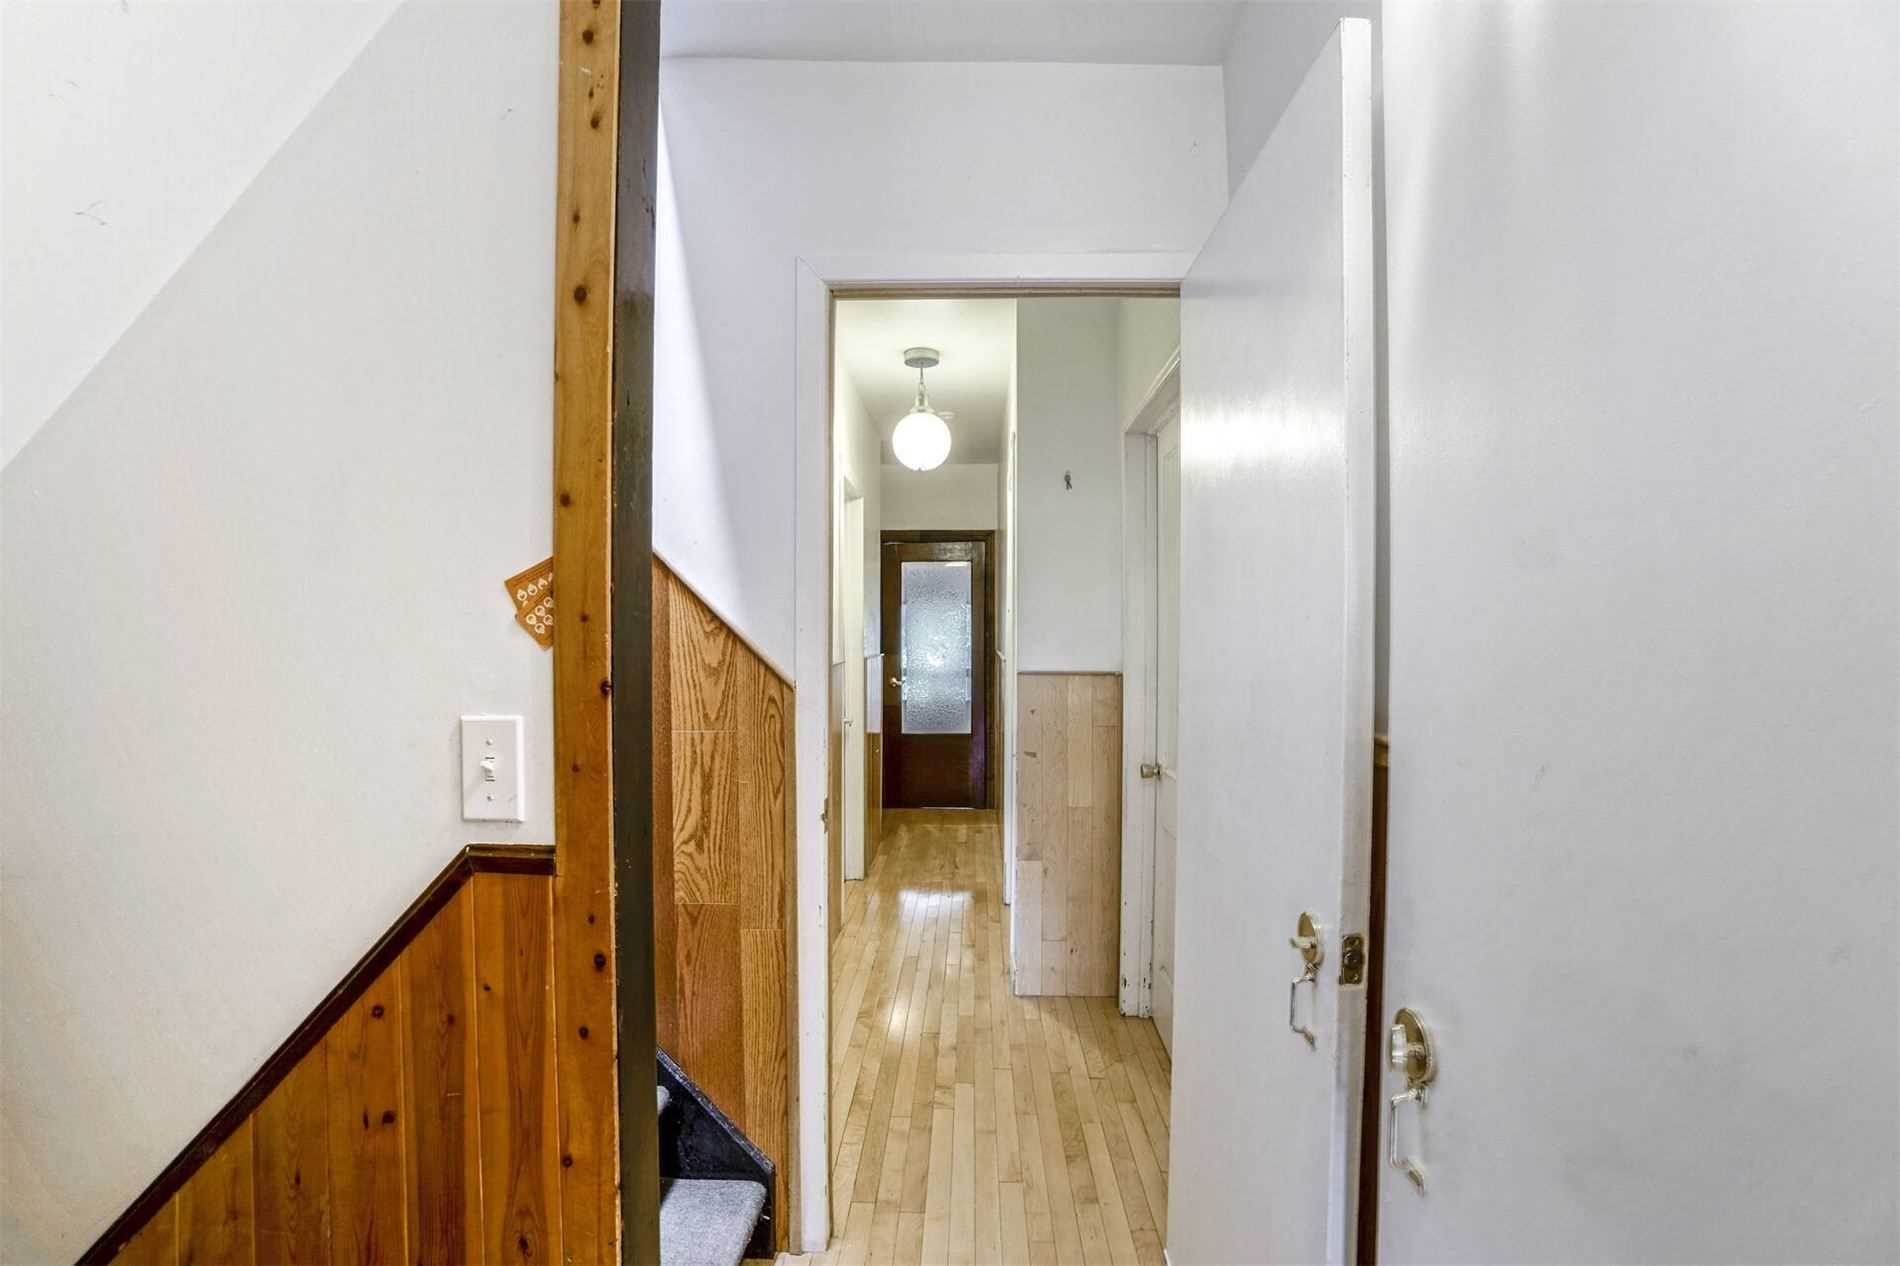 Detached house For Sale In Toronto - 90 Garden Ave, Toronto, Ontario, Canada M6R1H7 , 6 Bedrooms Bedrooms, ,6 BathroomsBathrooms,Detached,For Sale,Garden